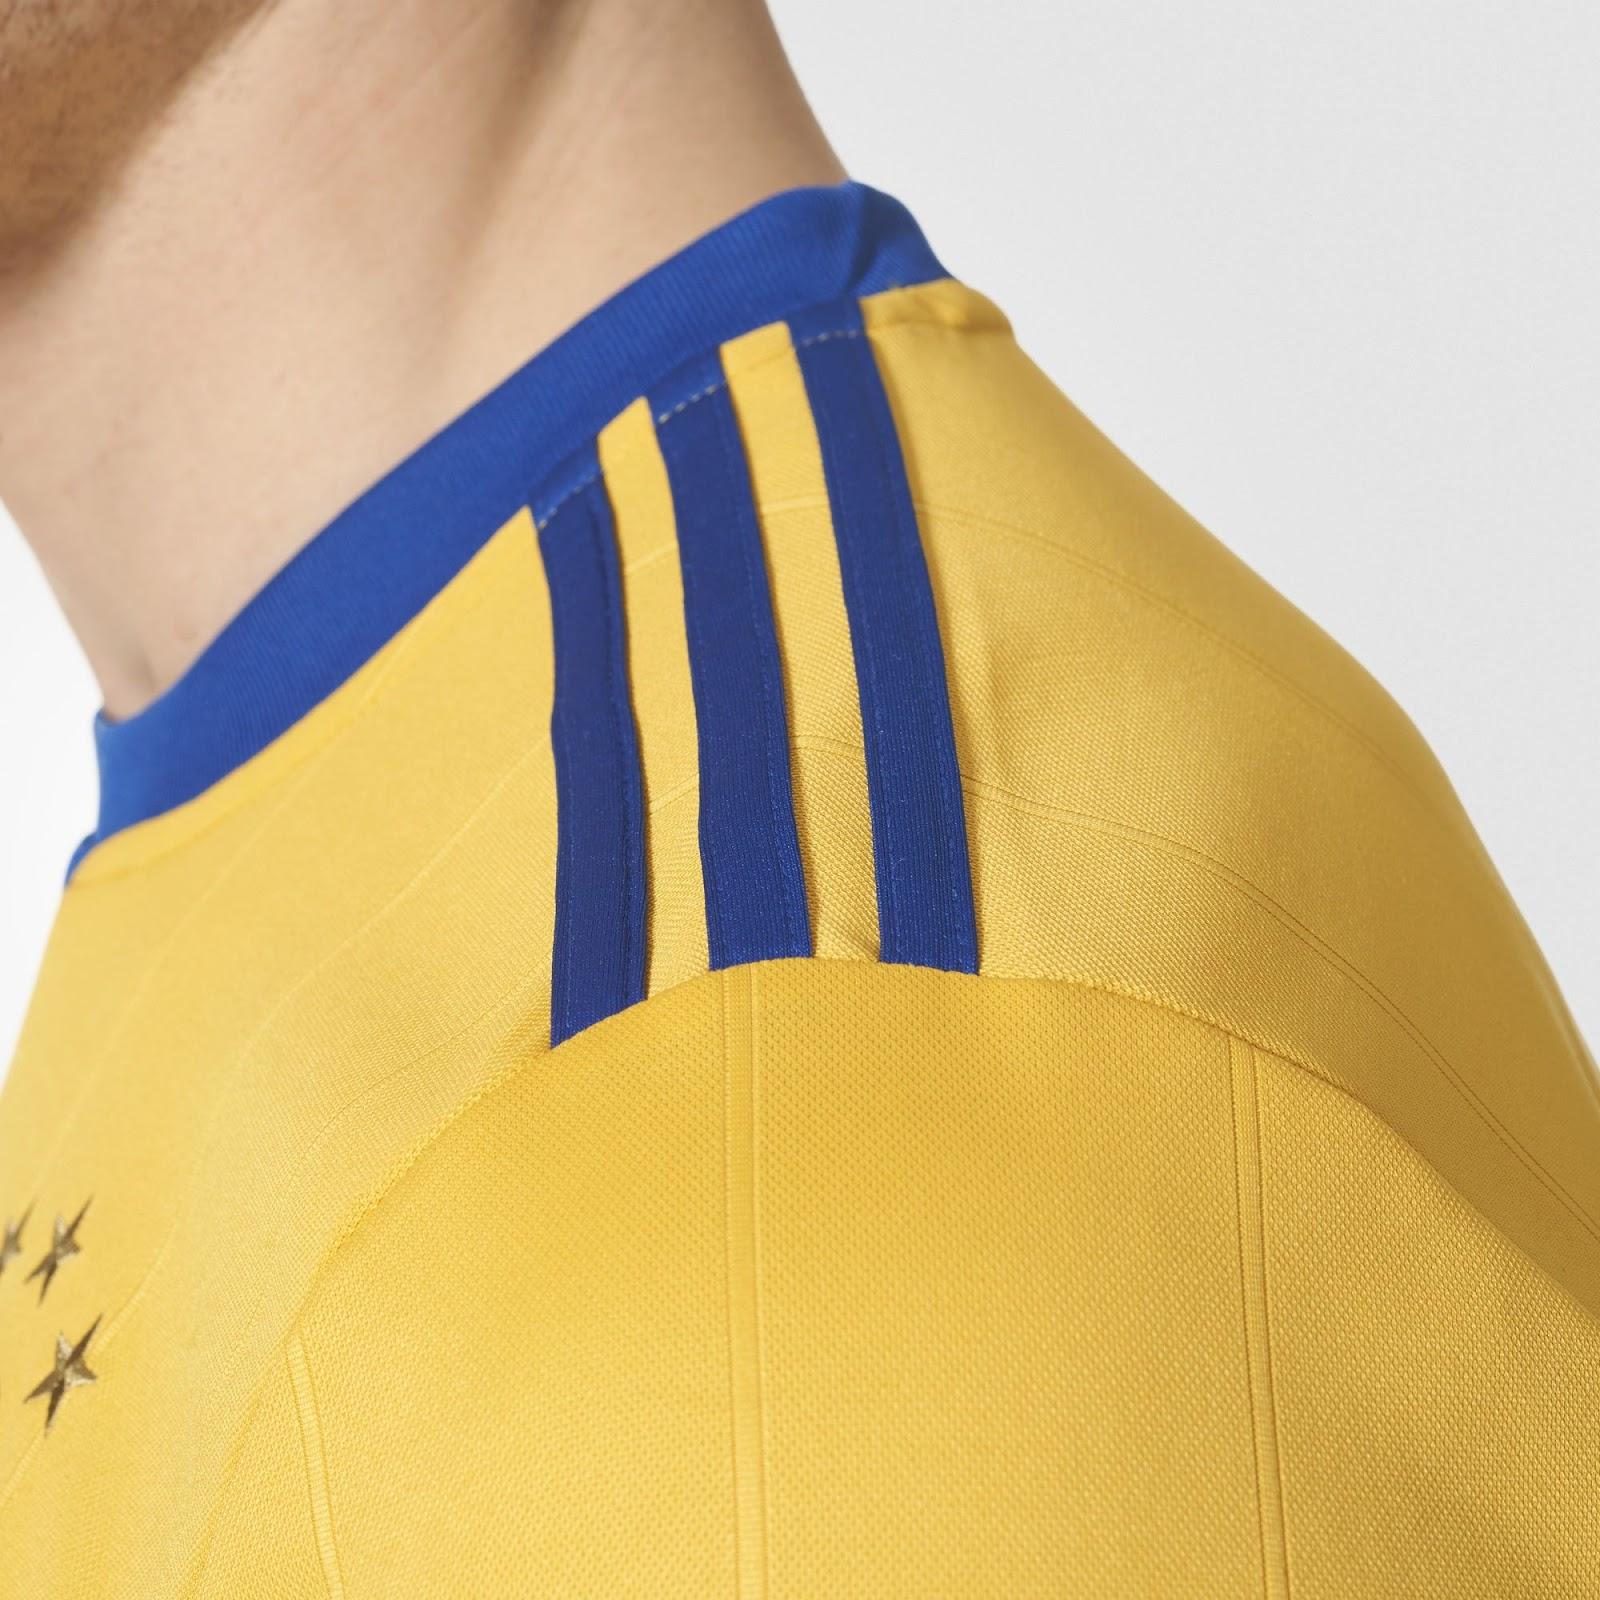 new-juventus-17-18-away-shirt-shoulder